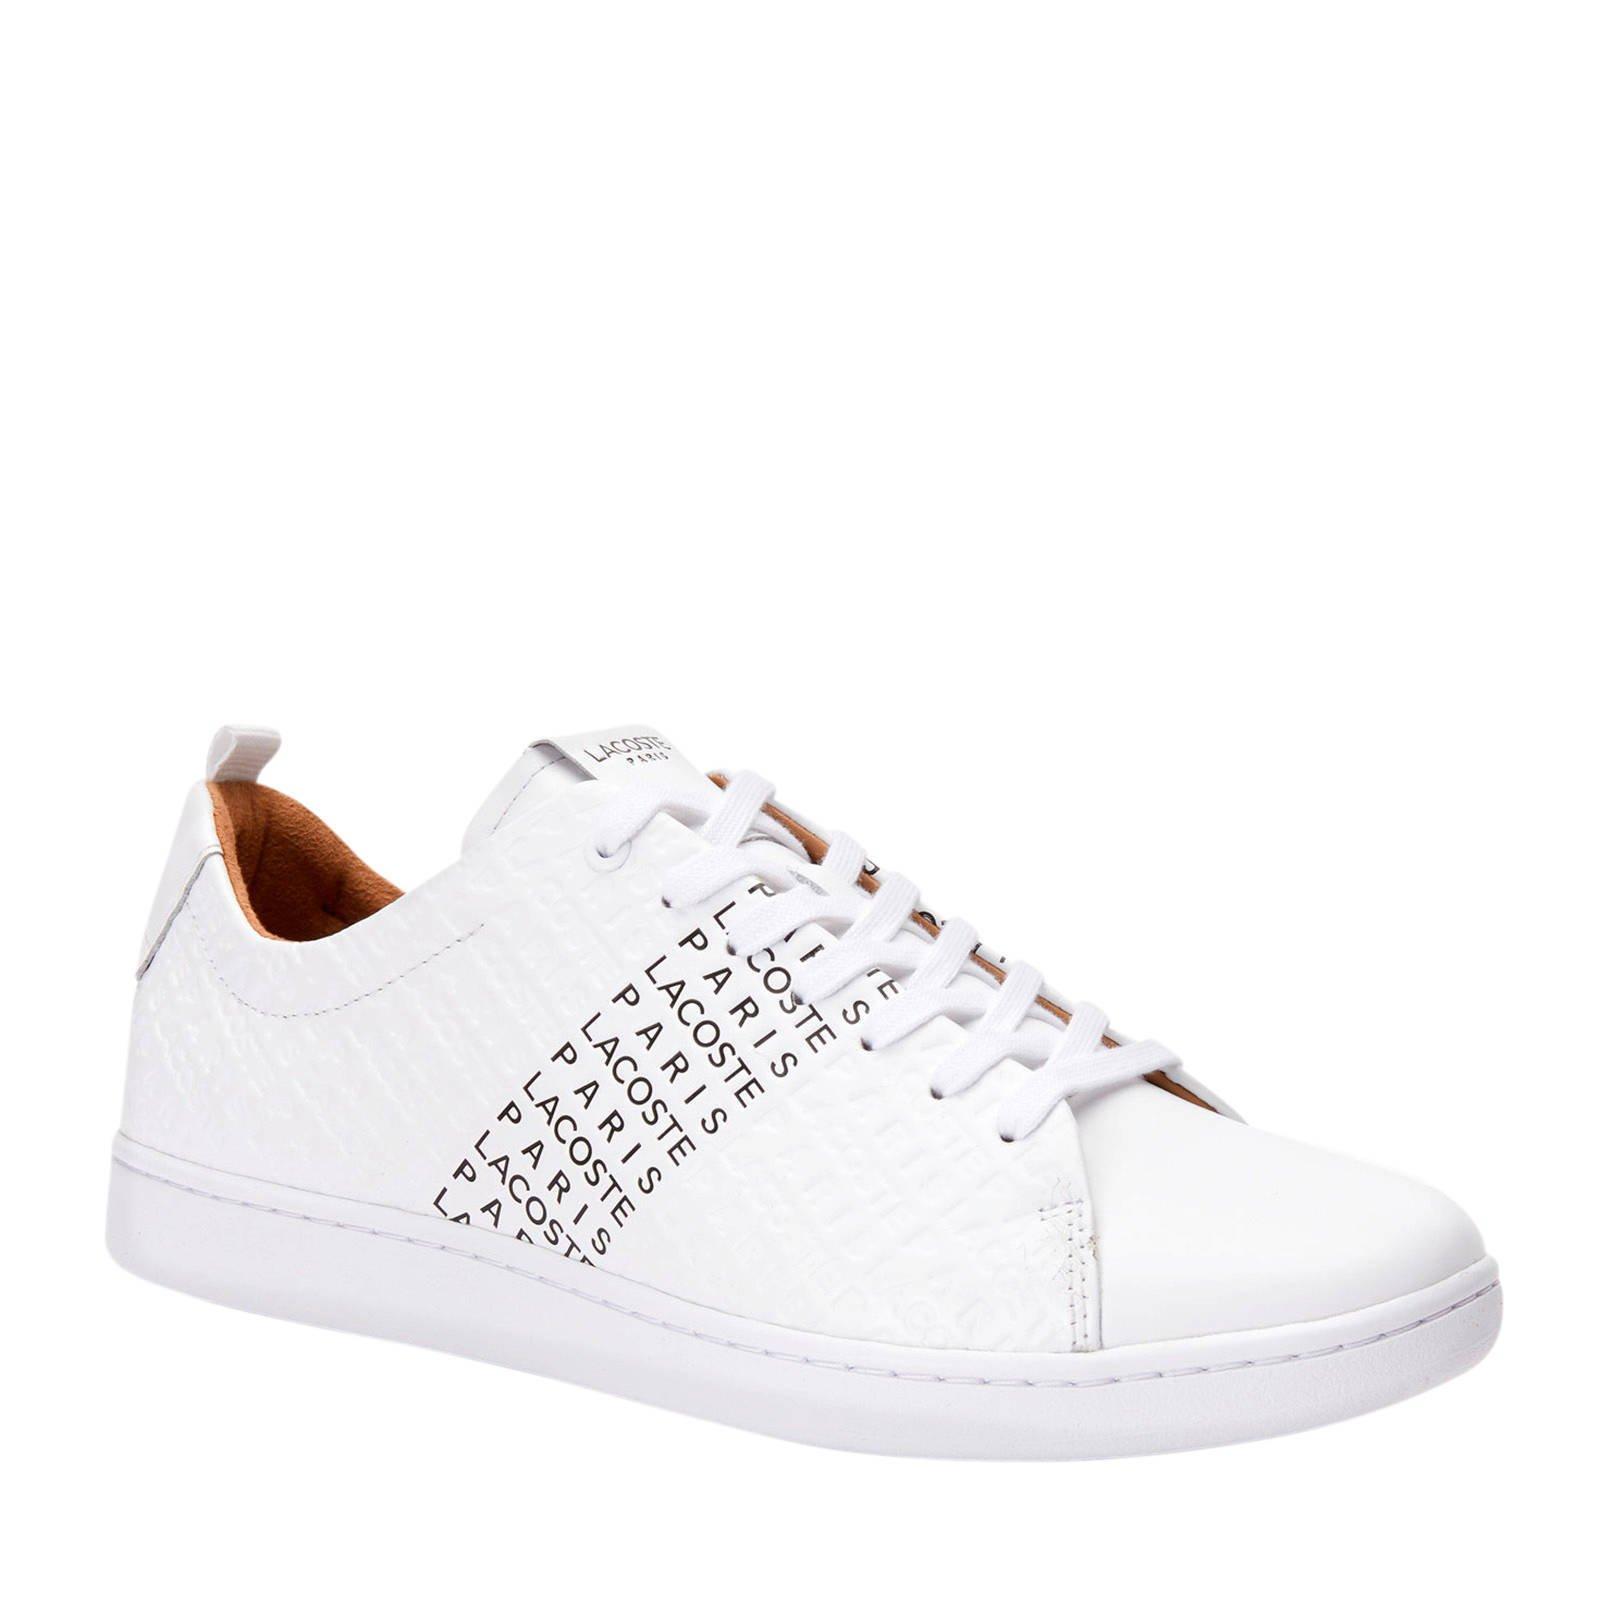 Lacoste Carnaby Evo 319 sneakers witzwart   wehkamp